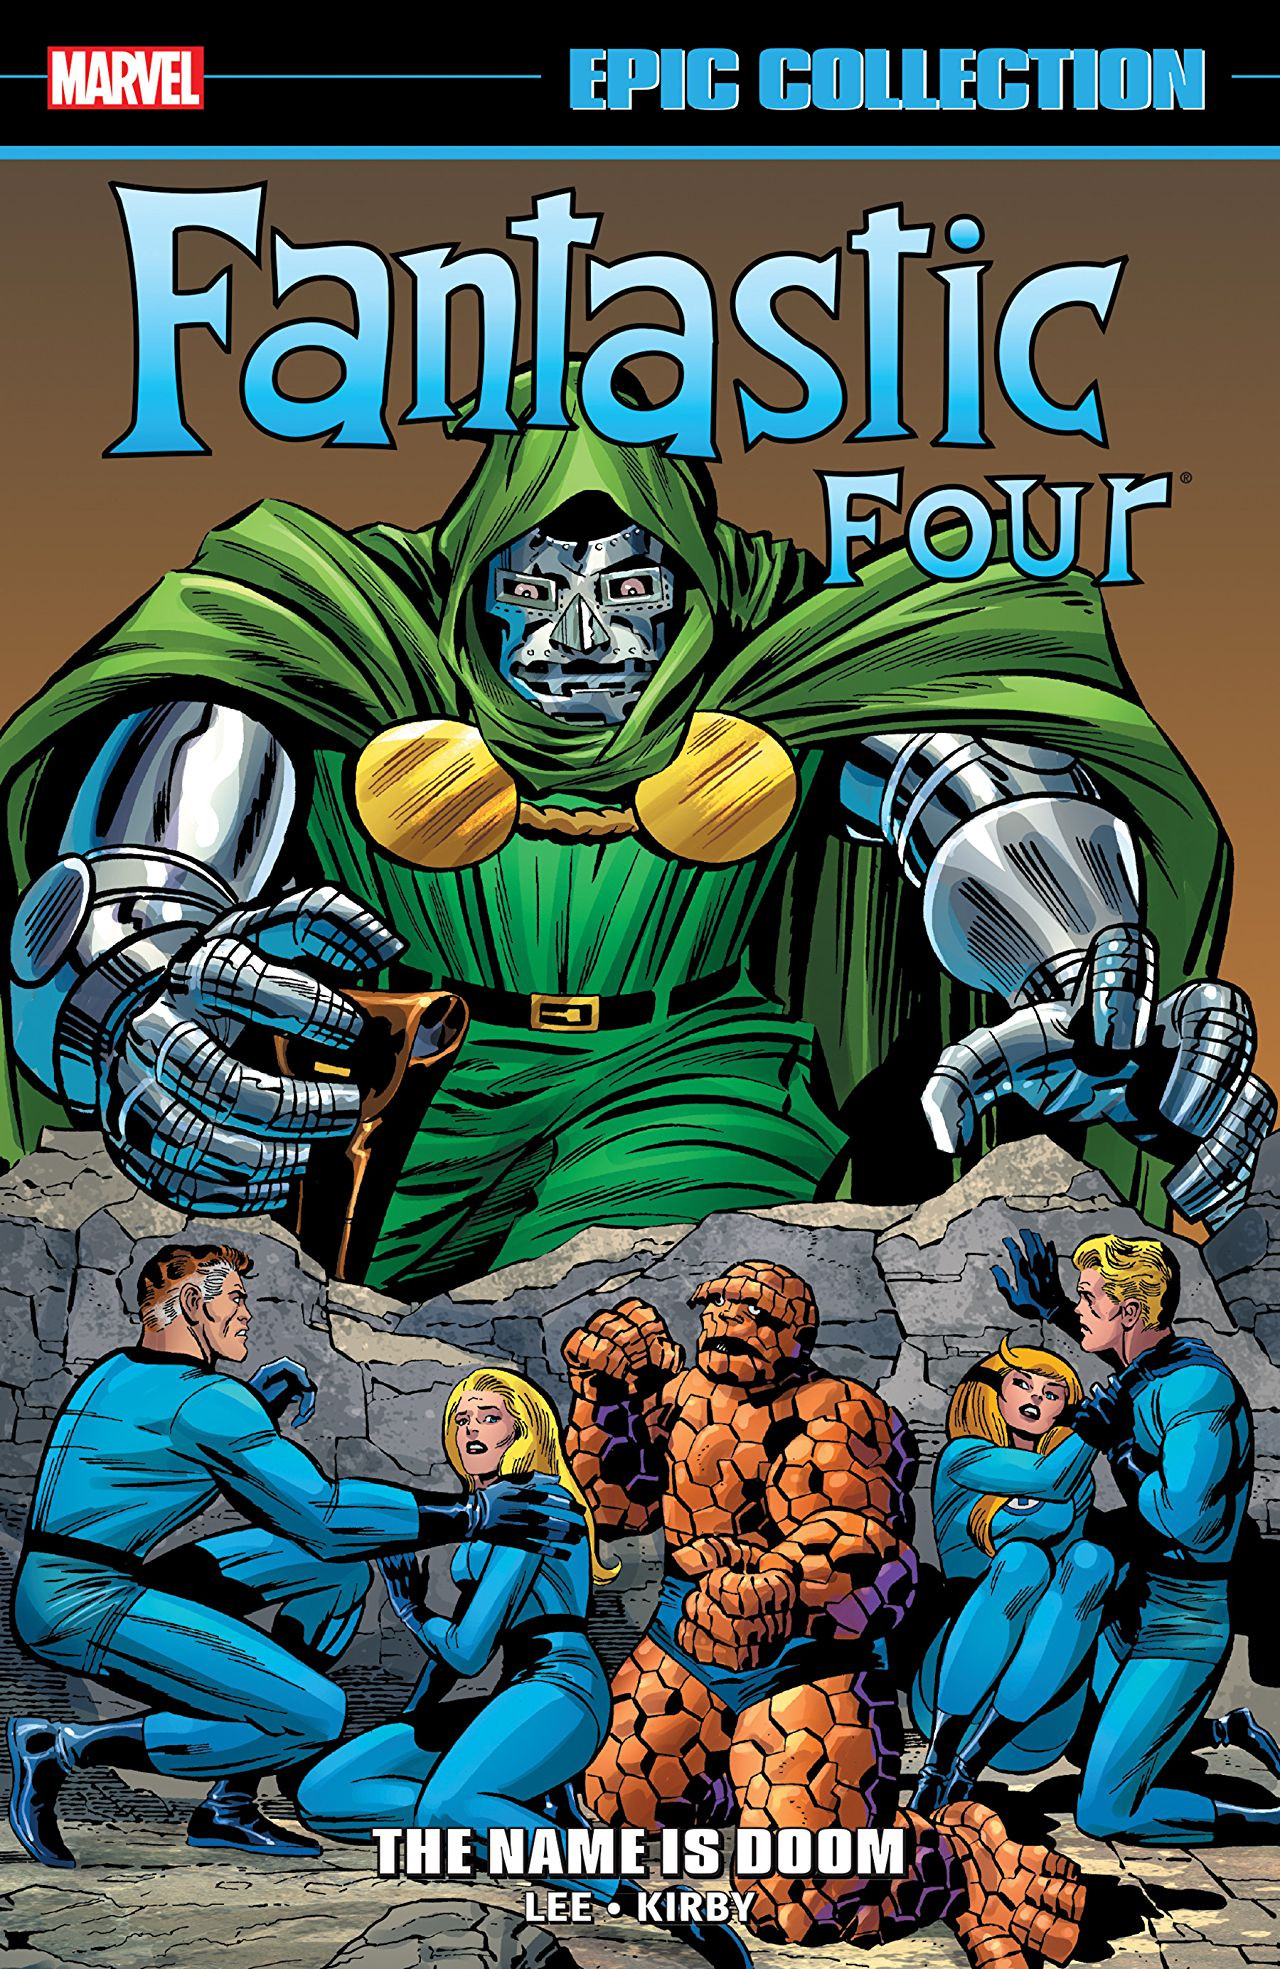 Epic Collection: Fantastic Four Vol 1 5